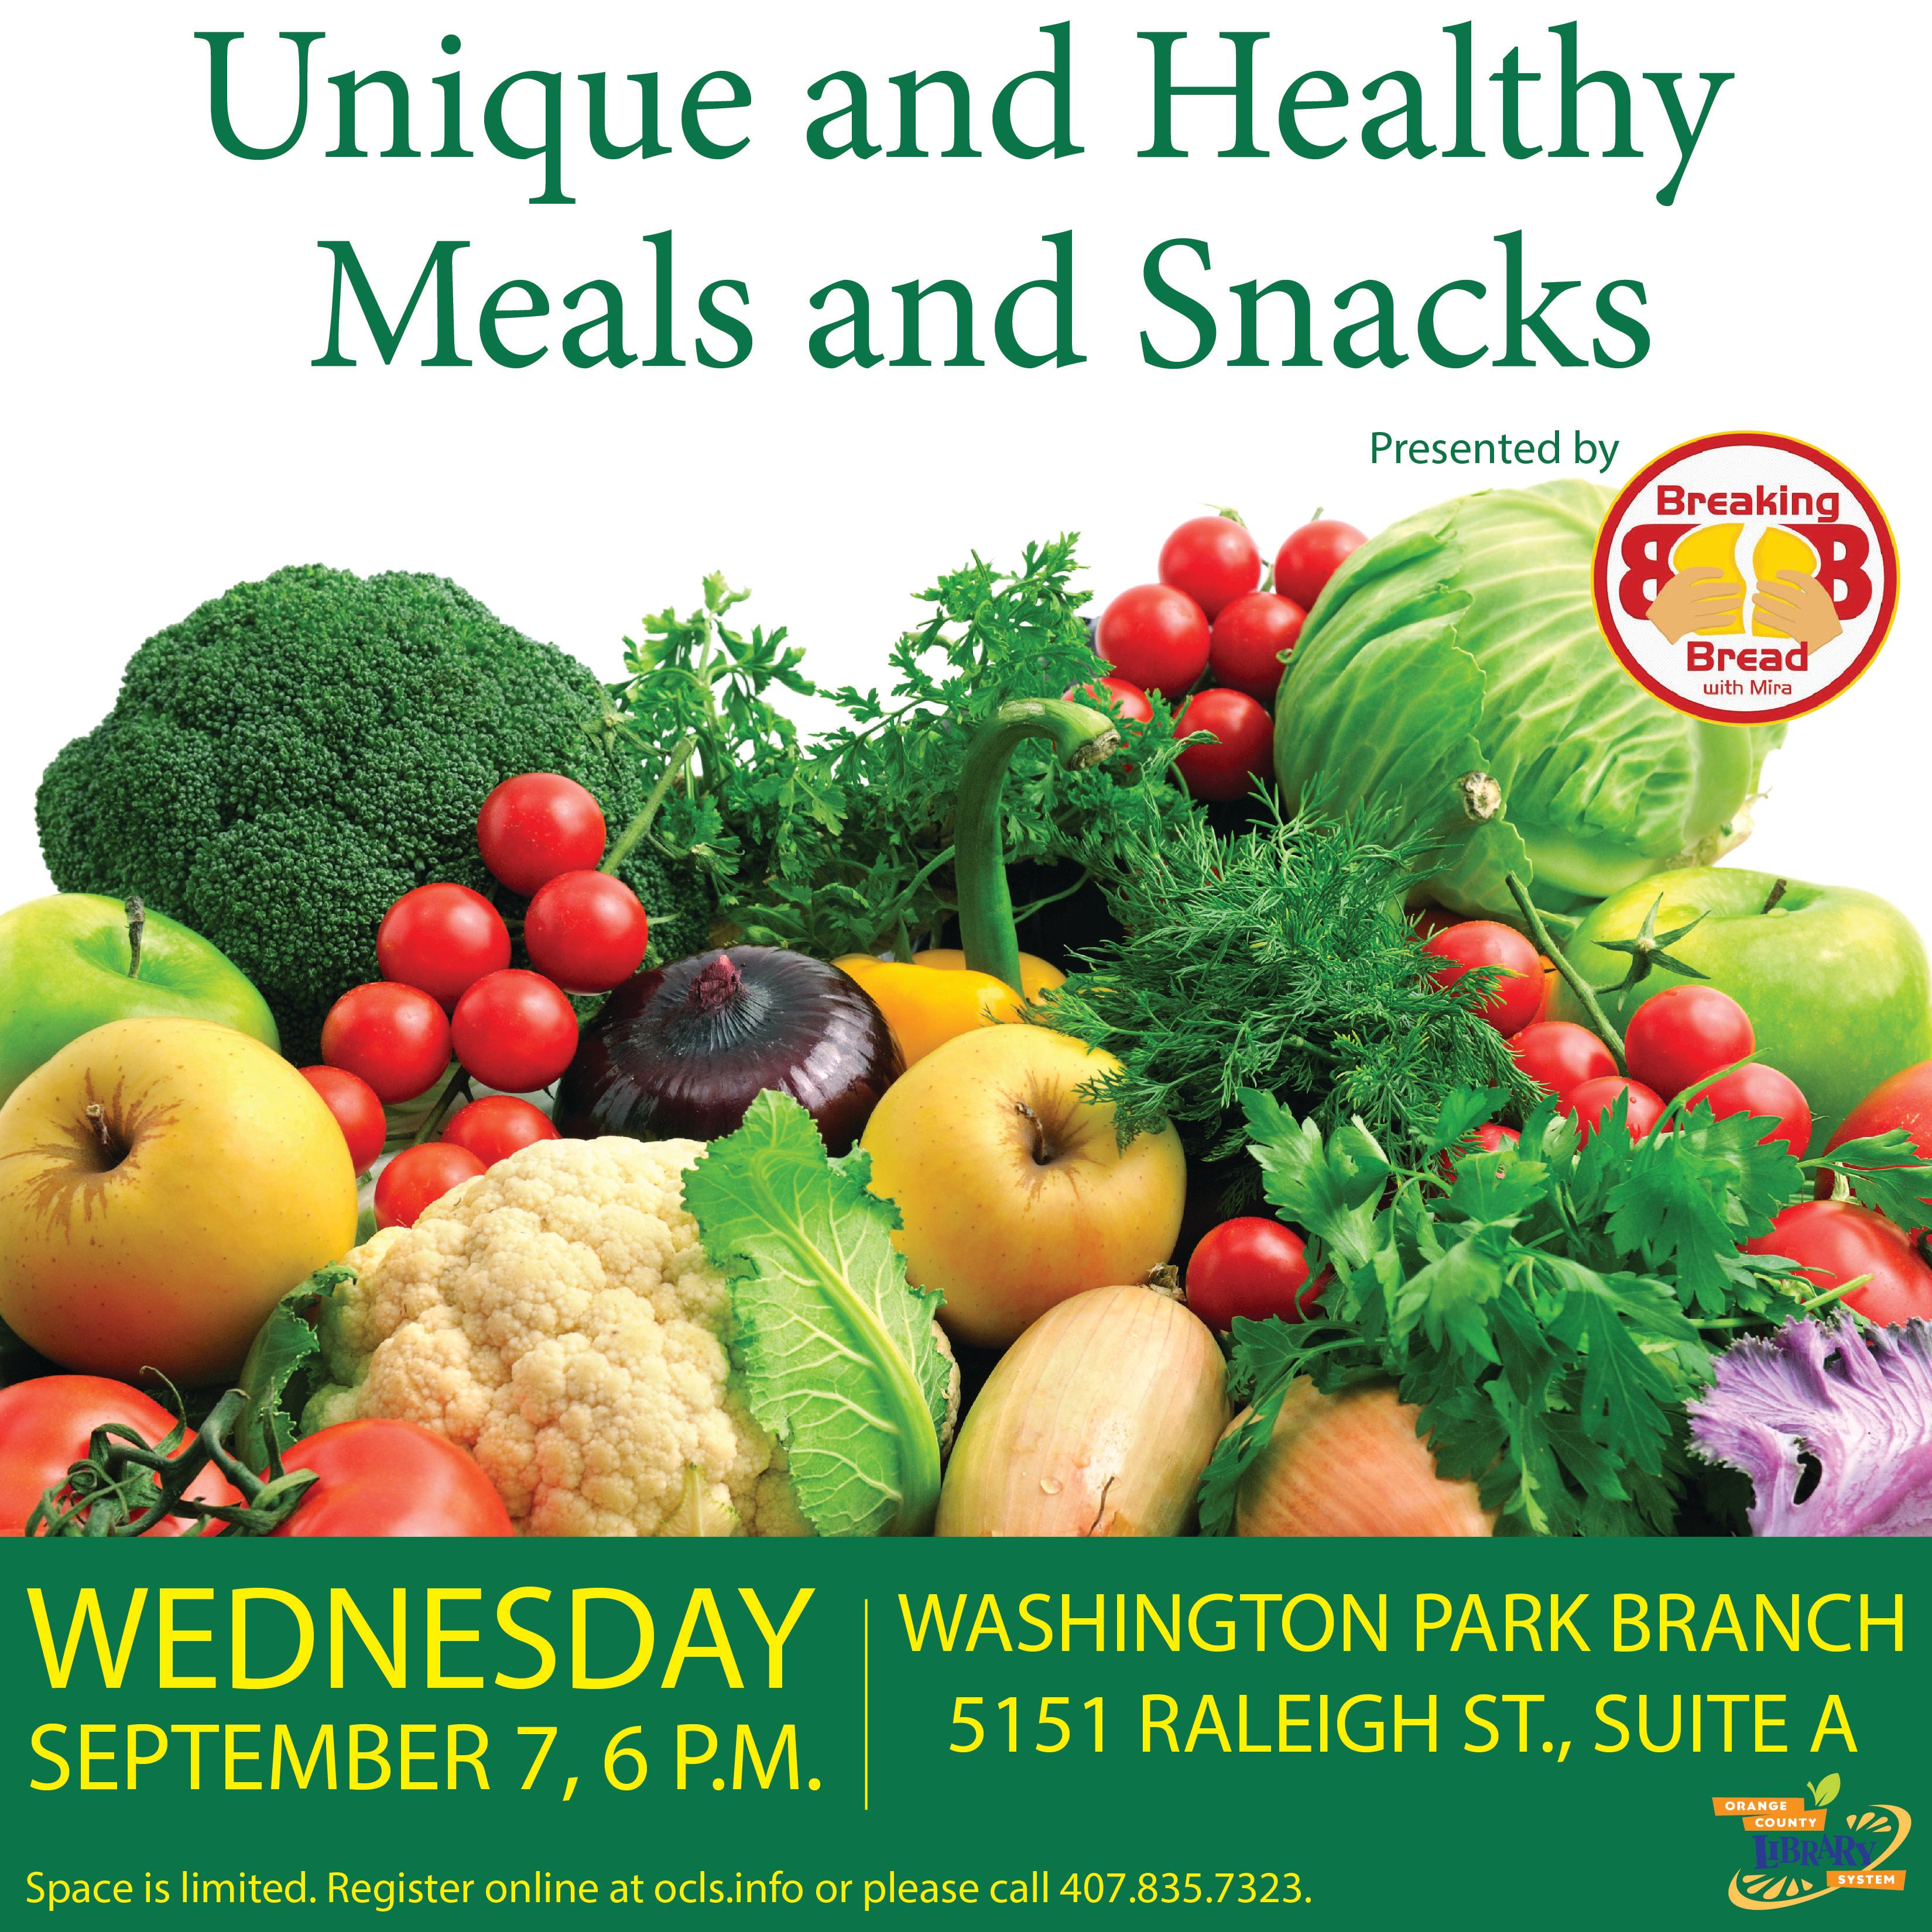 Unique and Healthy Meals and Snacks Washington Park 9-8-16 social media-01